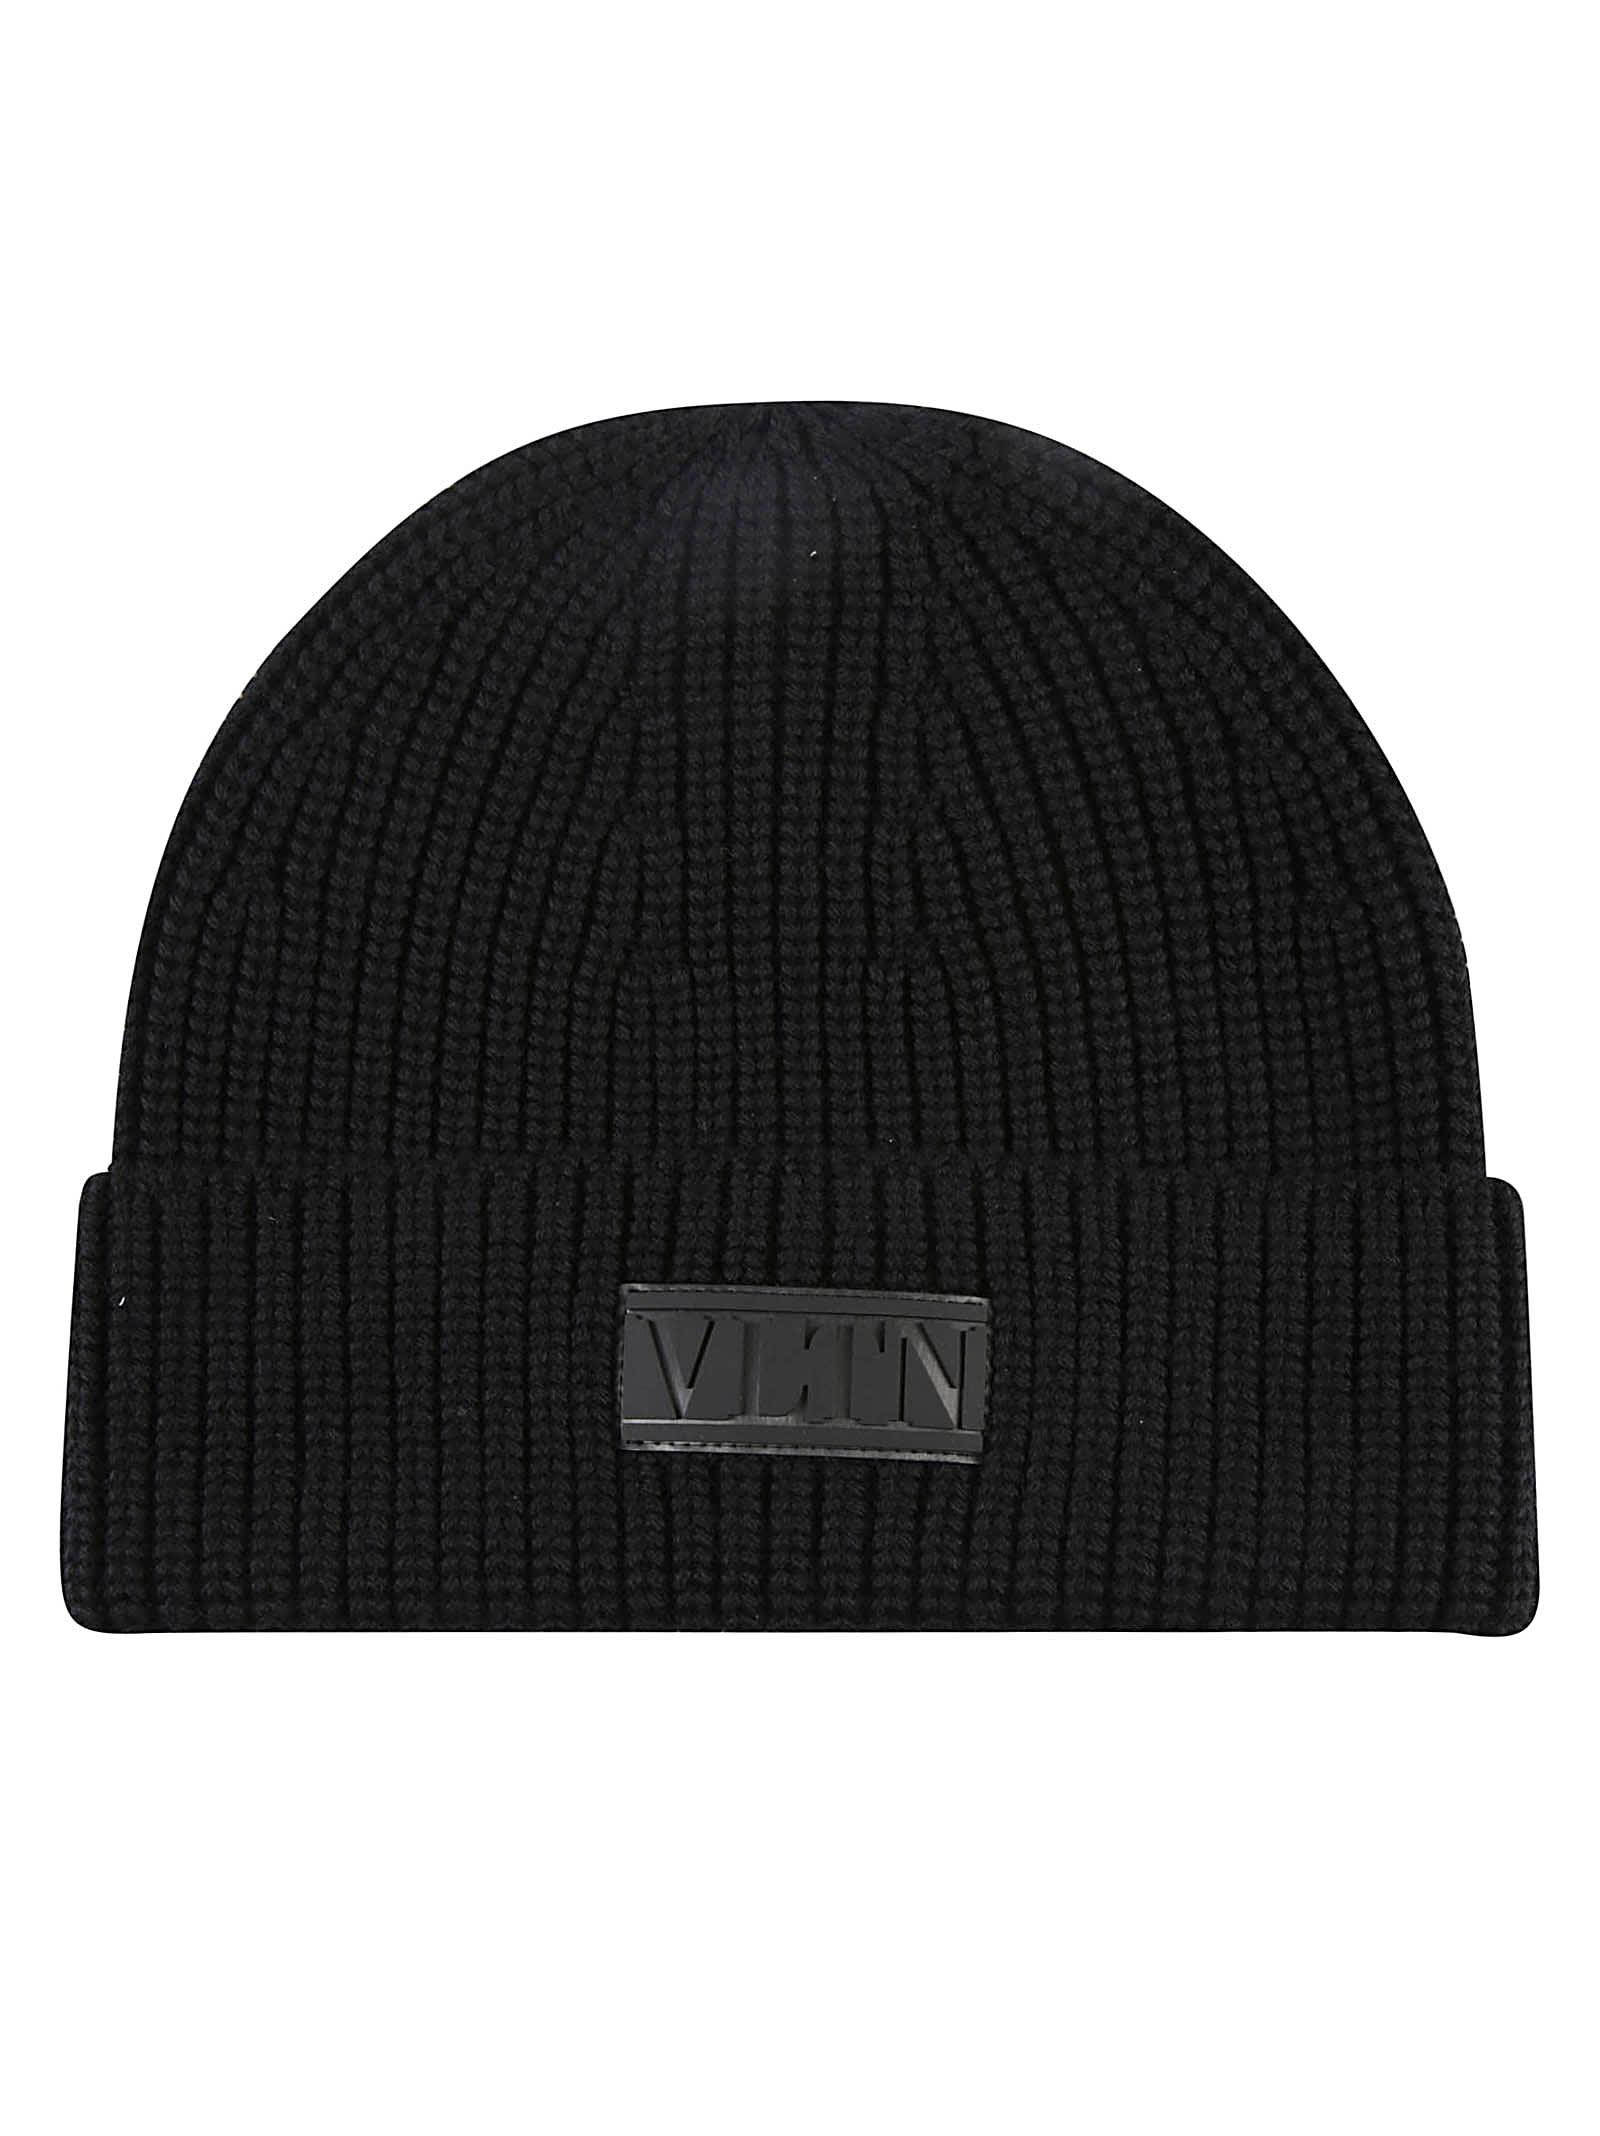 Valentino Garavani Vltn Logo Patched Knit Beanie In Nero/nero